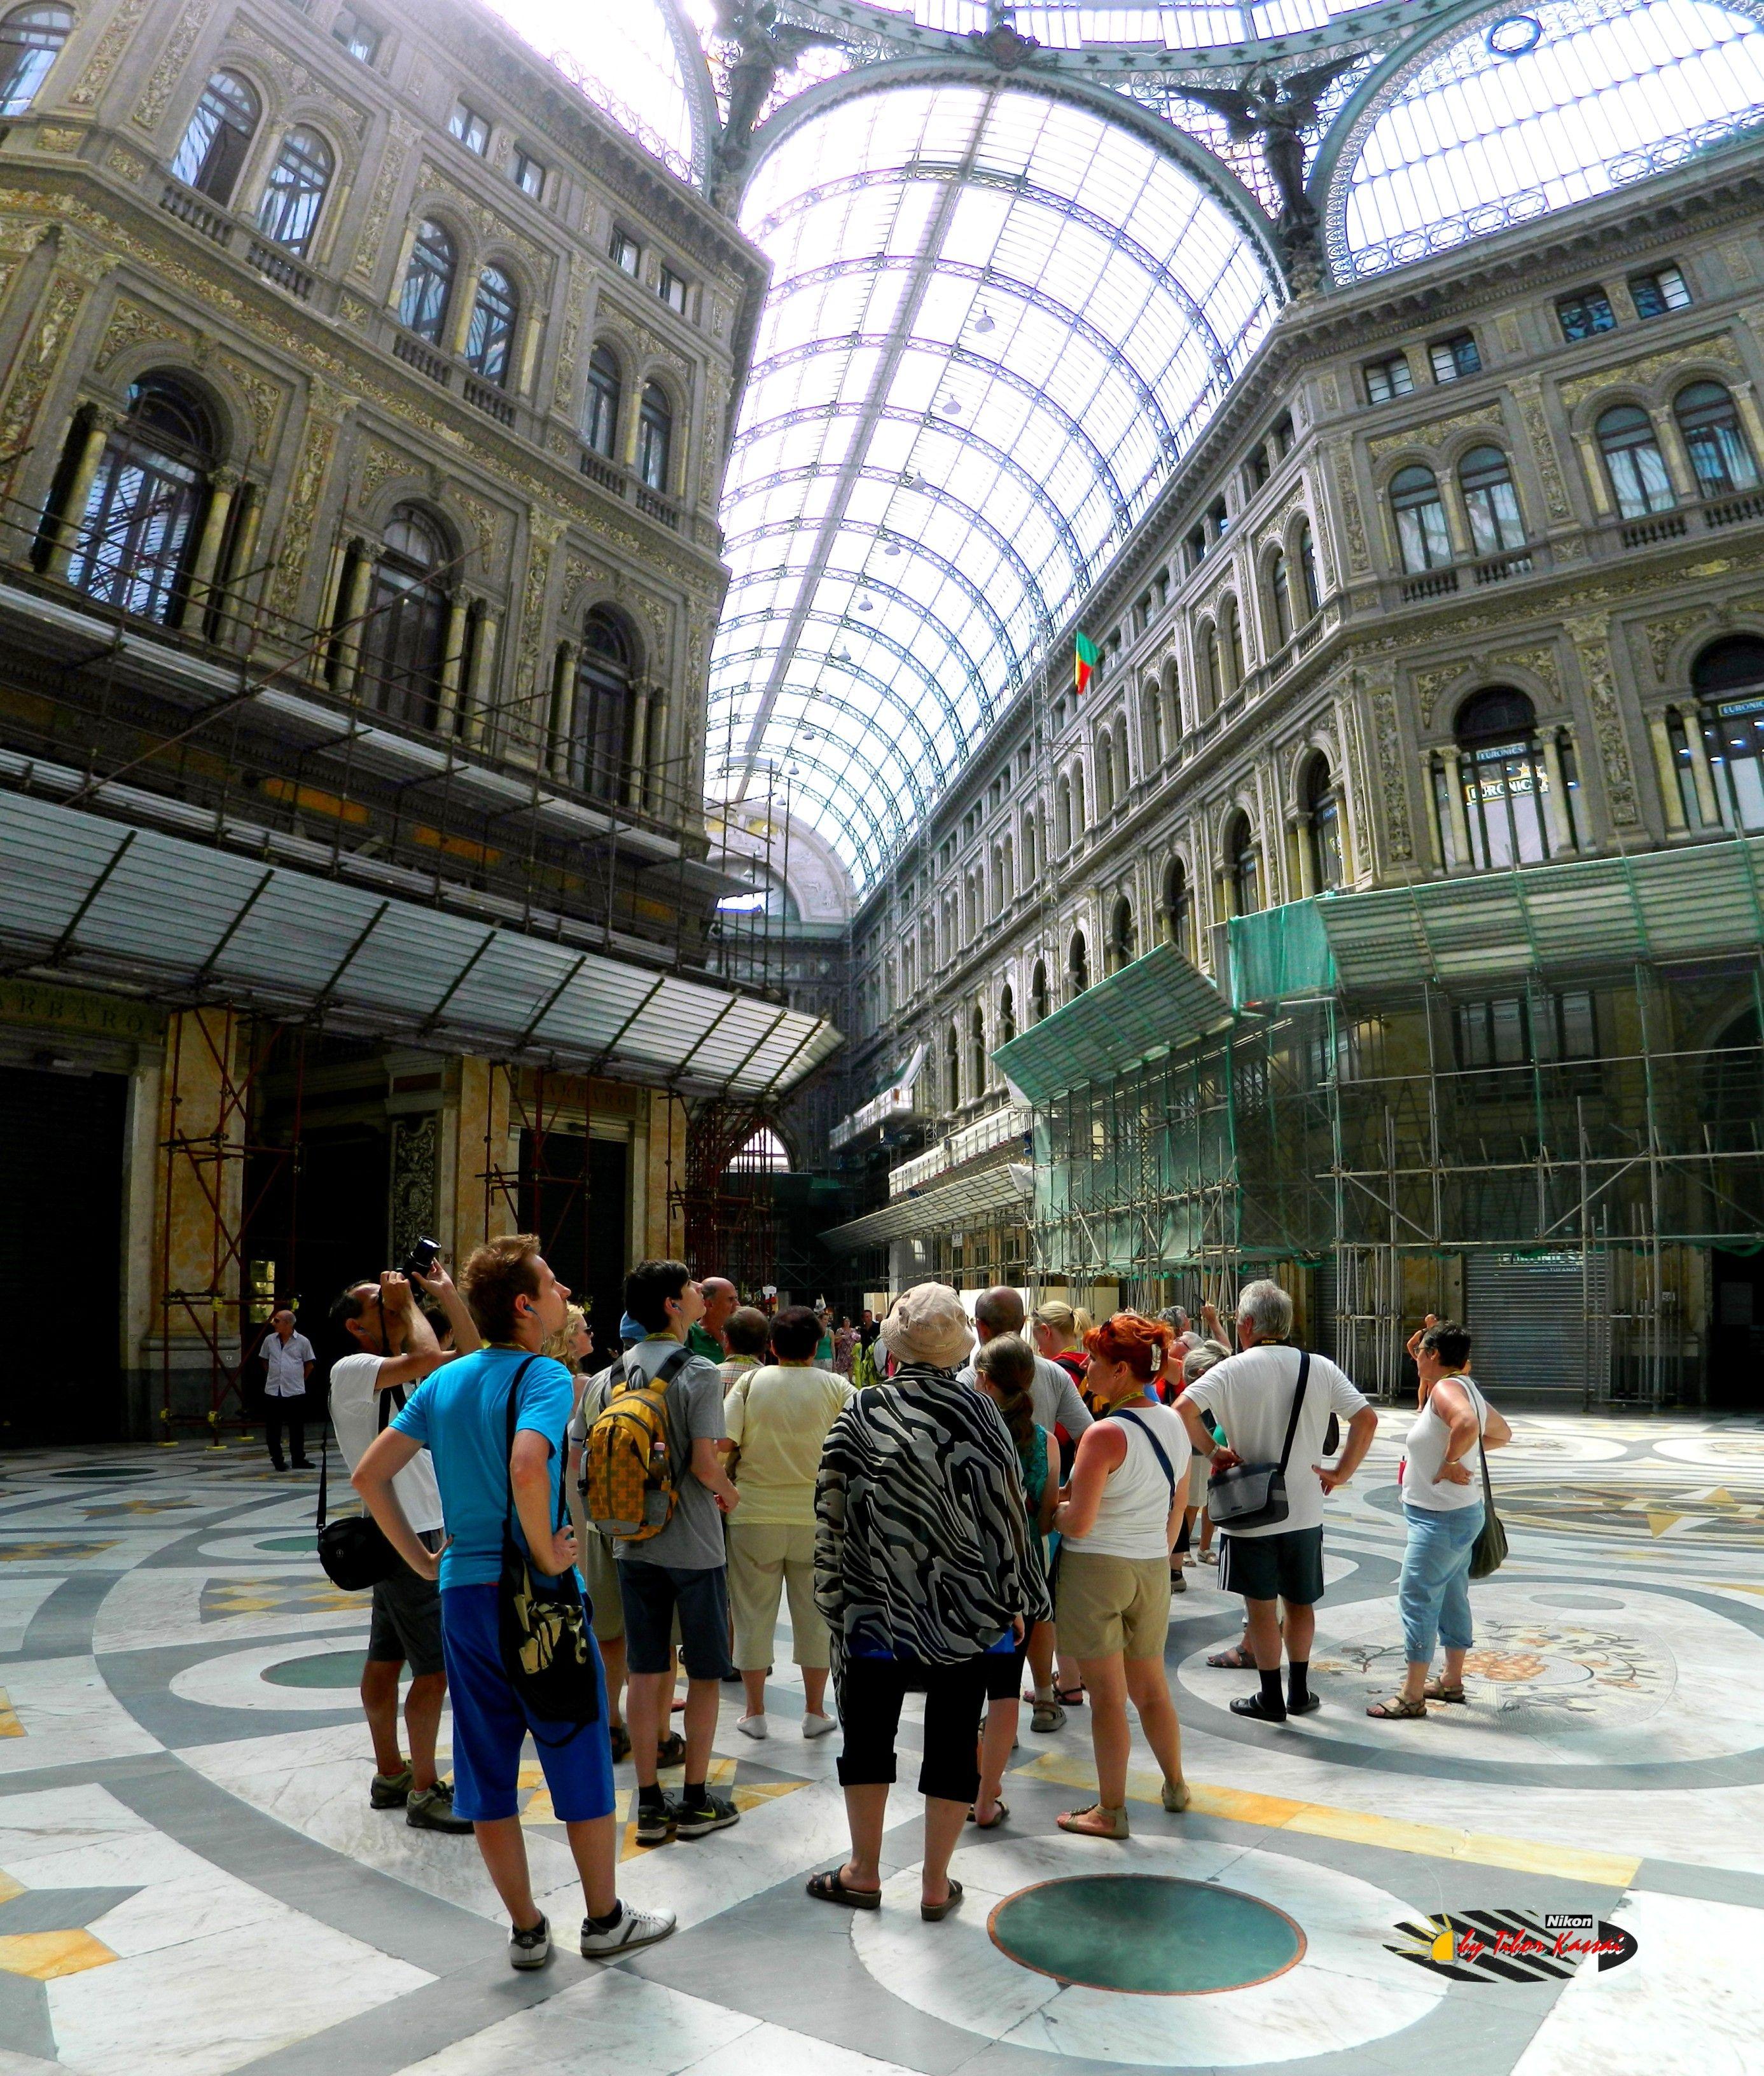 Galleria Umberto-Napoli, Nikon Coolpix L310, 4.5mm,1.200s,ISO80,f/3.1,panorama mode: segment 2, 201507131546